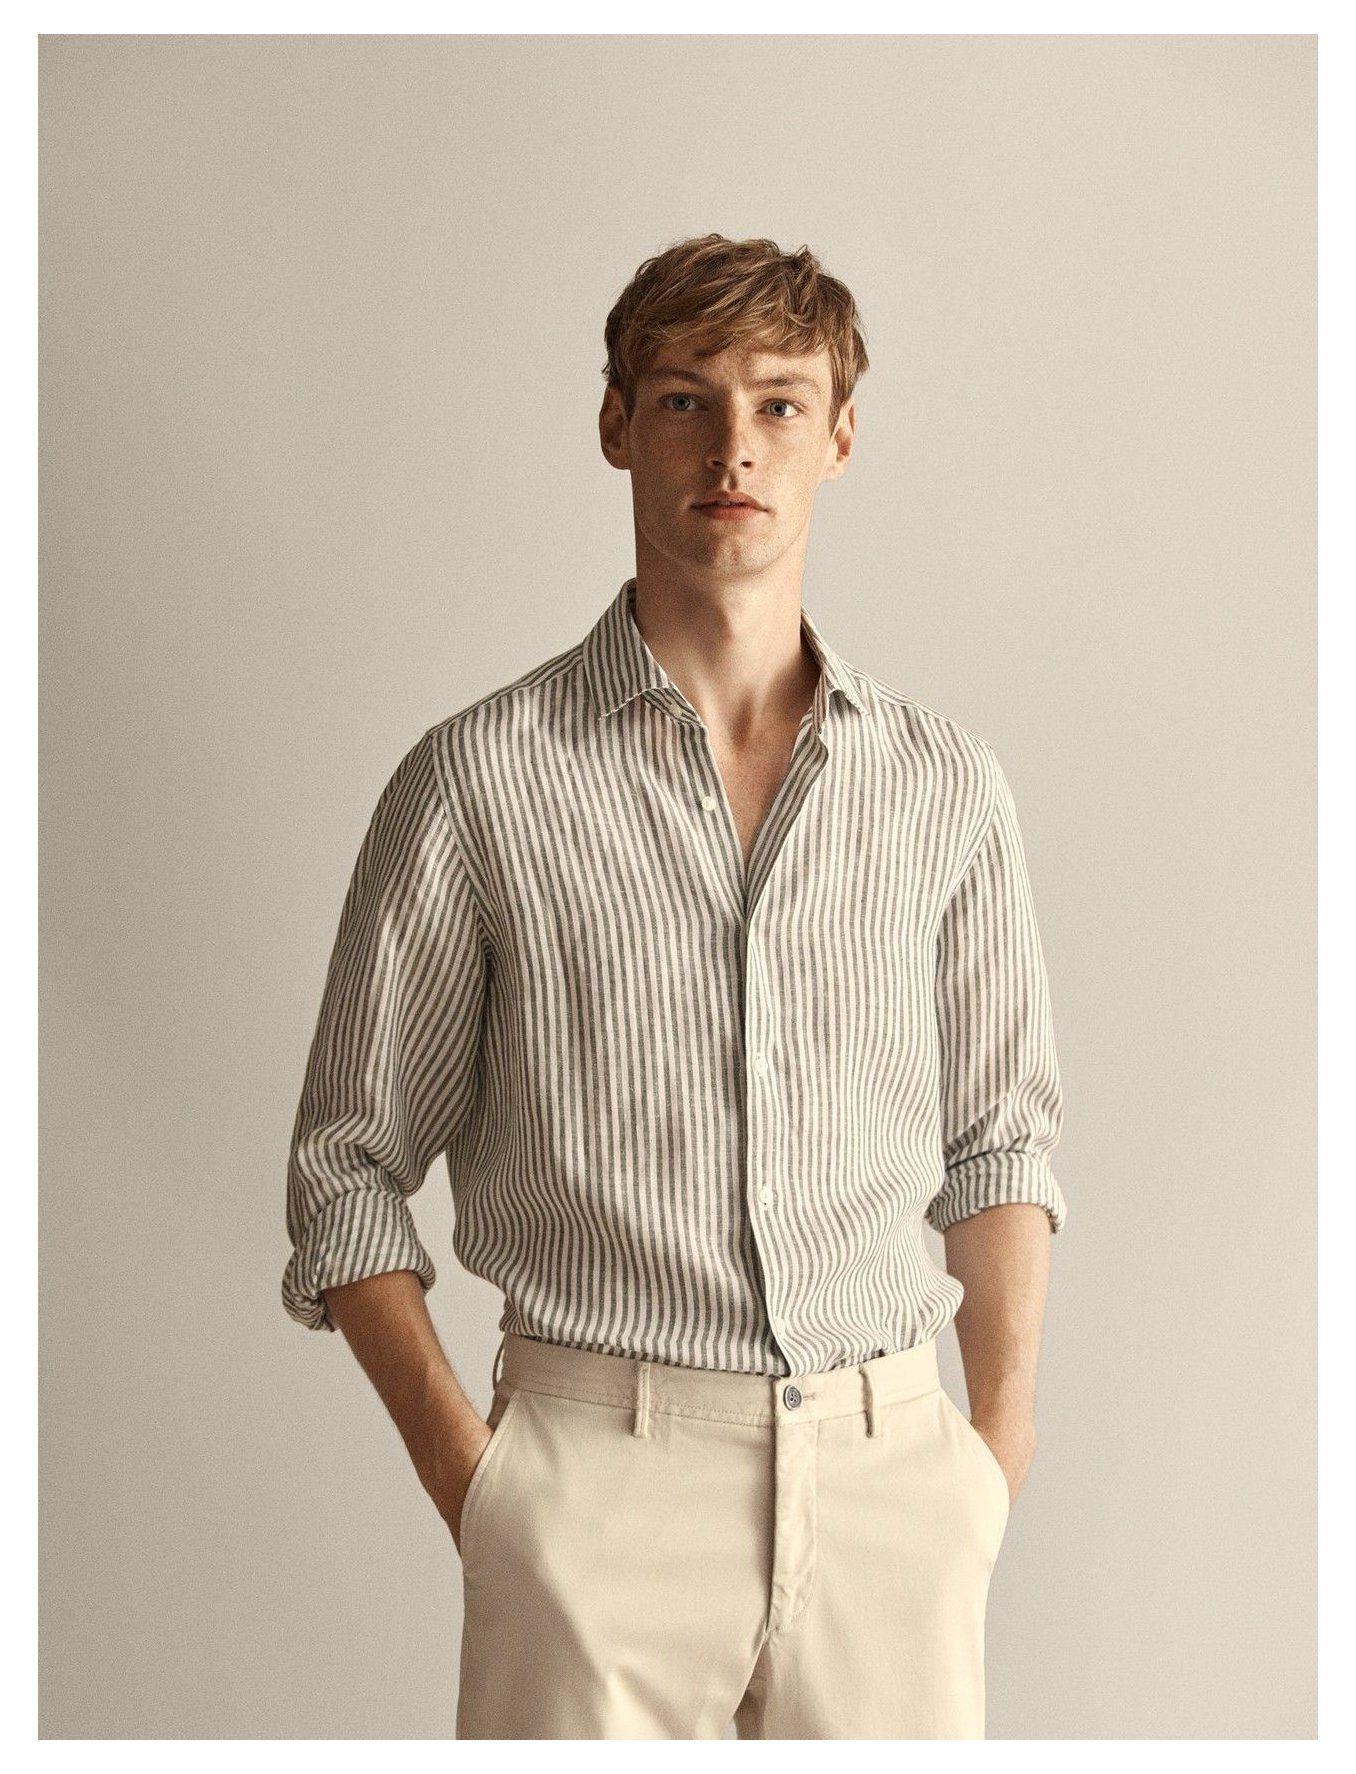 170 trendy dress fashion style guys - page 36